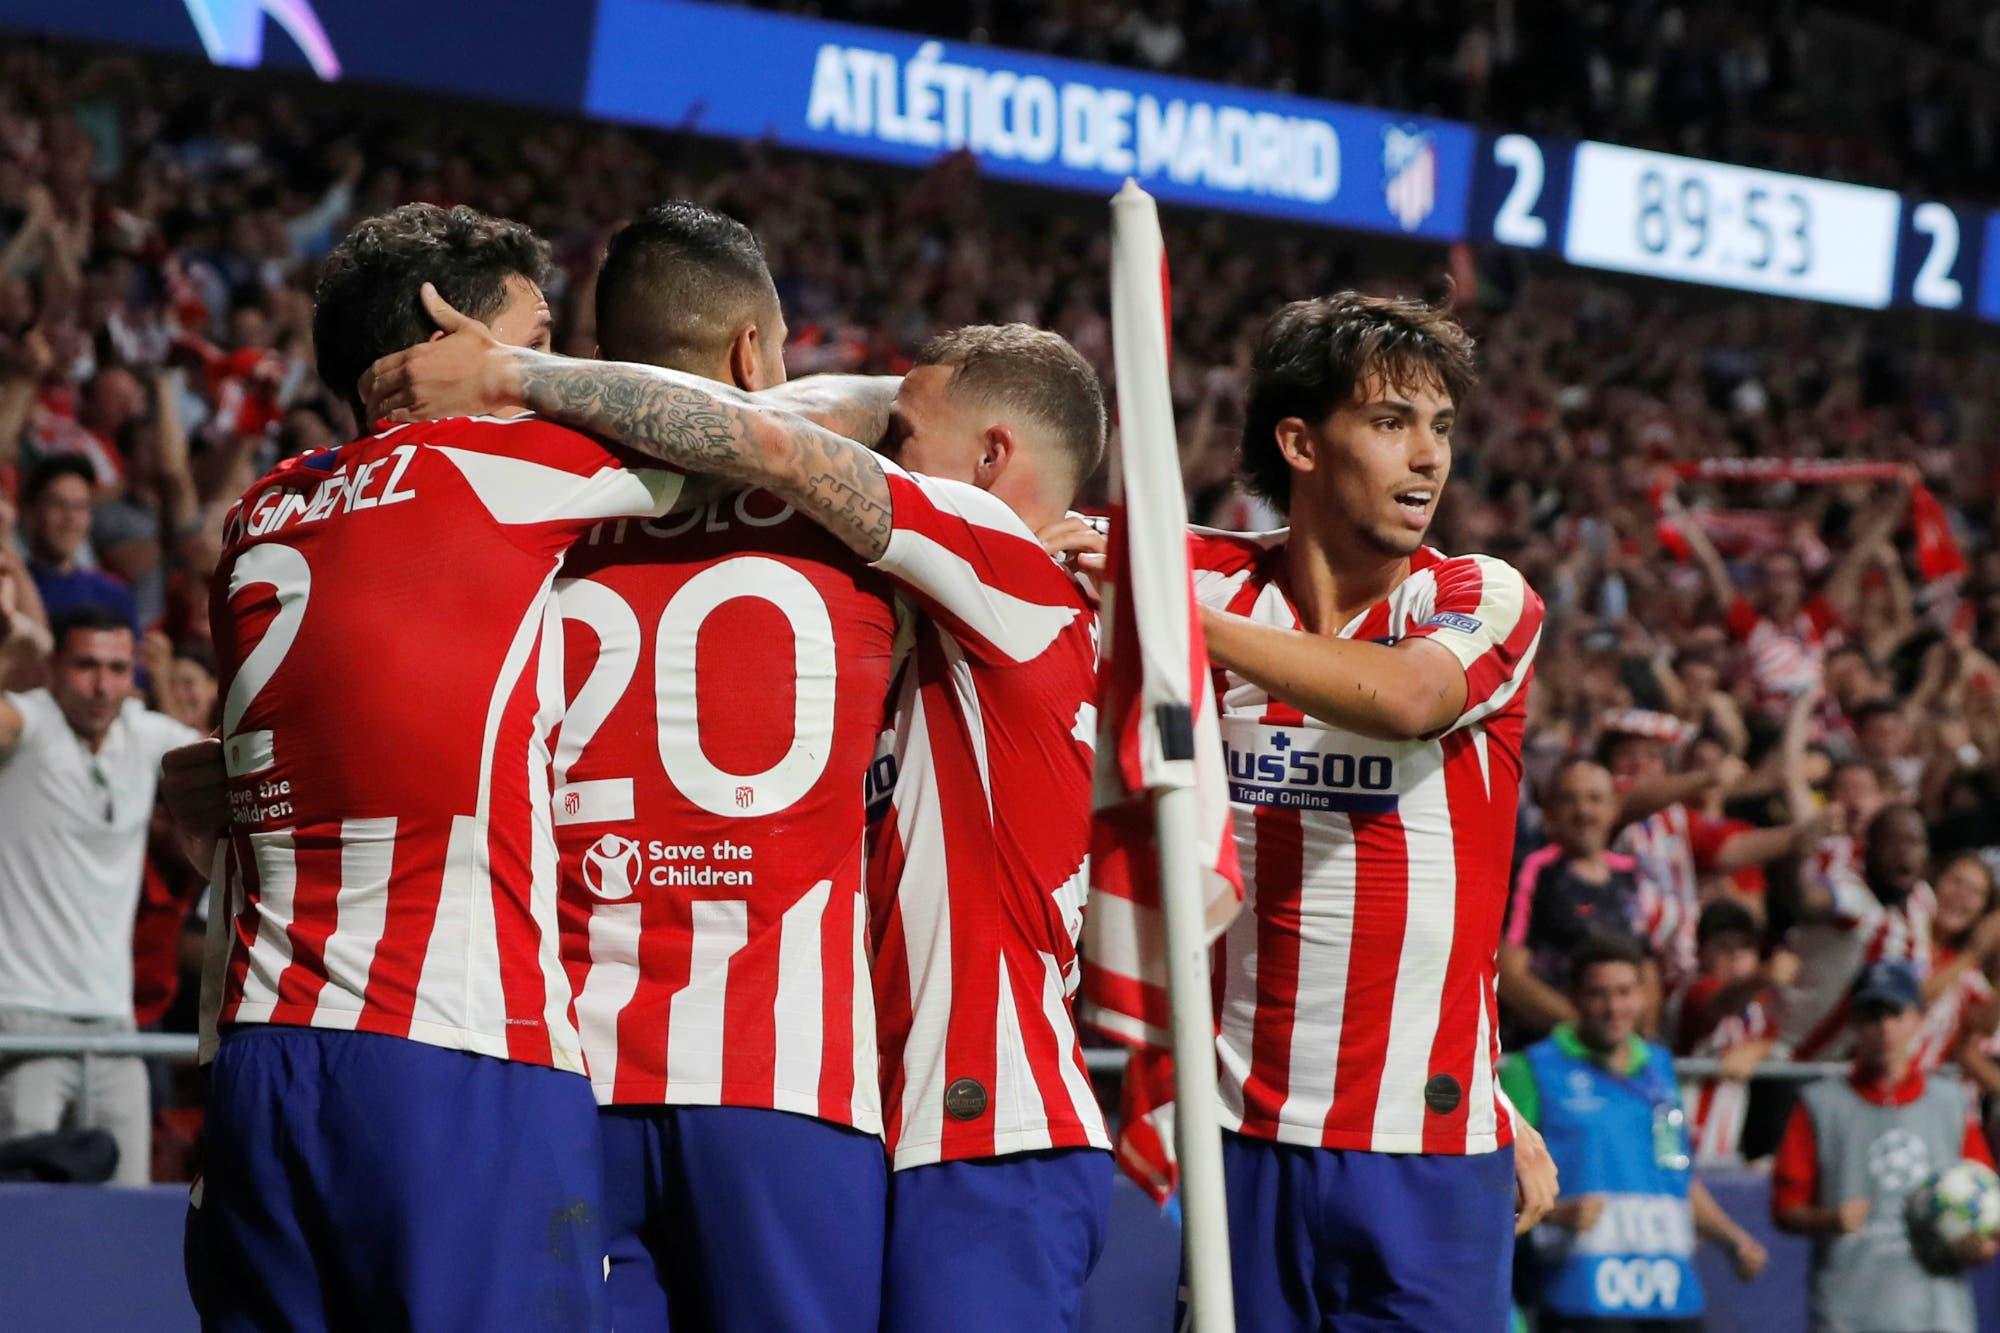 Champions League: Atlético de Madrid reaccionó y le empató a Juventus tras estar dos goles abajo